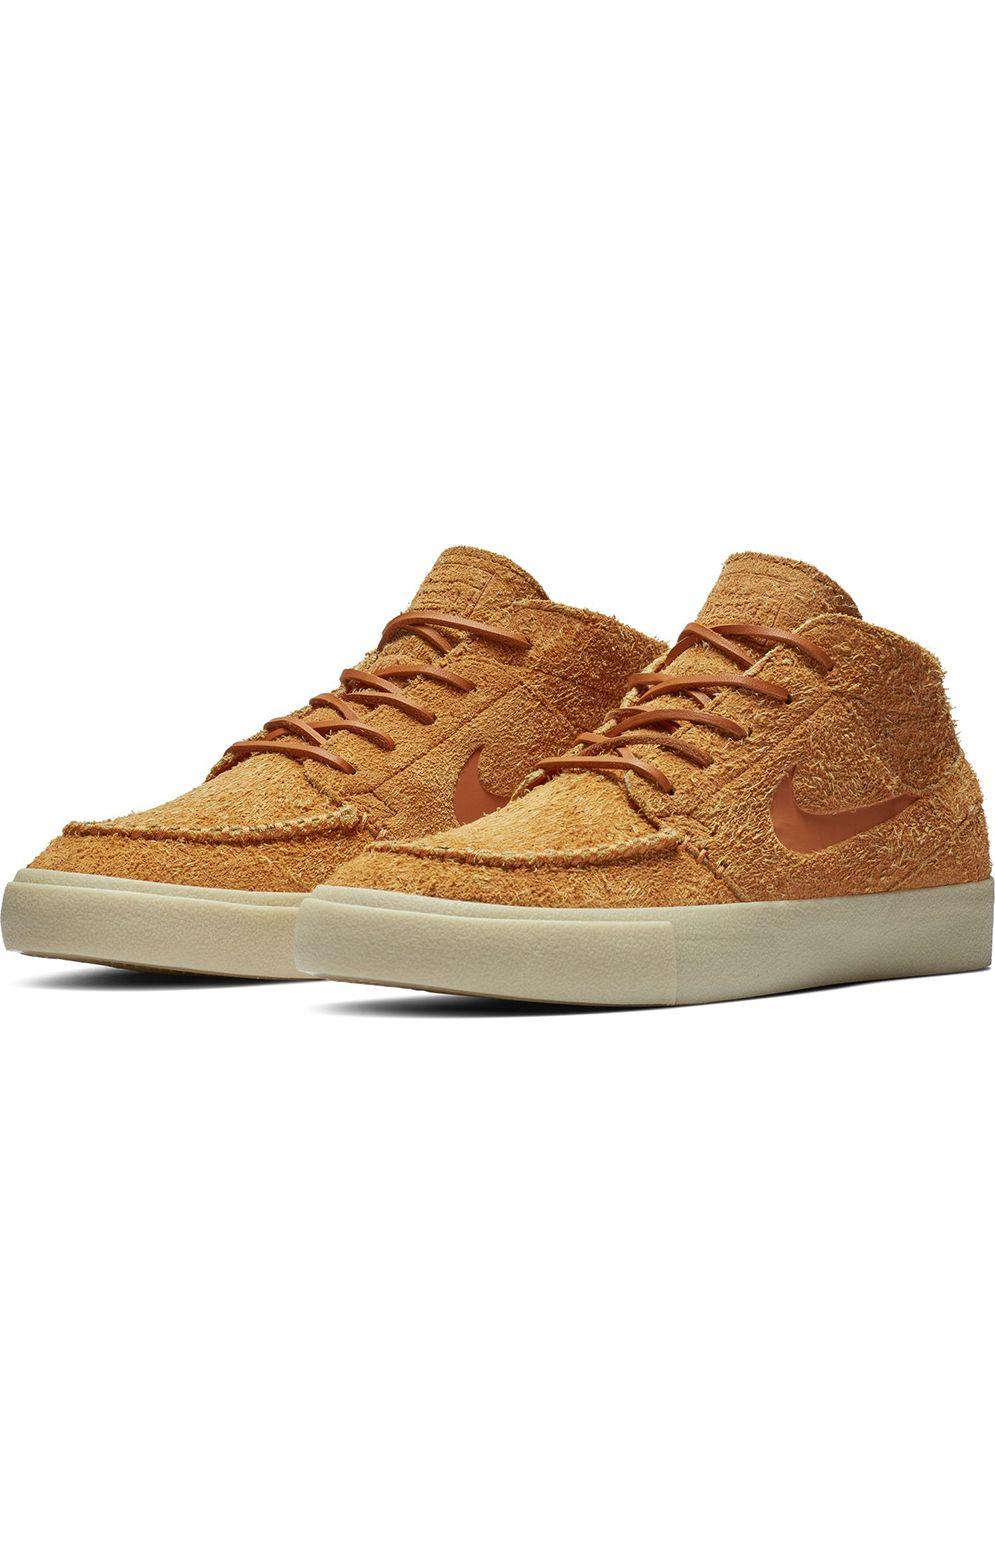 reputable site fc04f 04096 ... Nike Sb Shoes JANOSKI MID RM CRAFTED Cinder Orange Cinder Orange-Team  Gold-